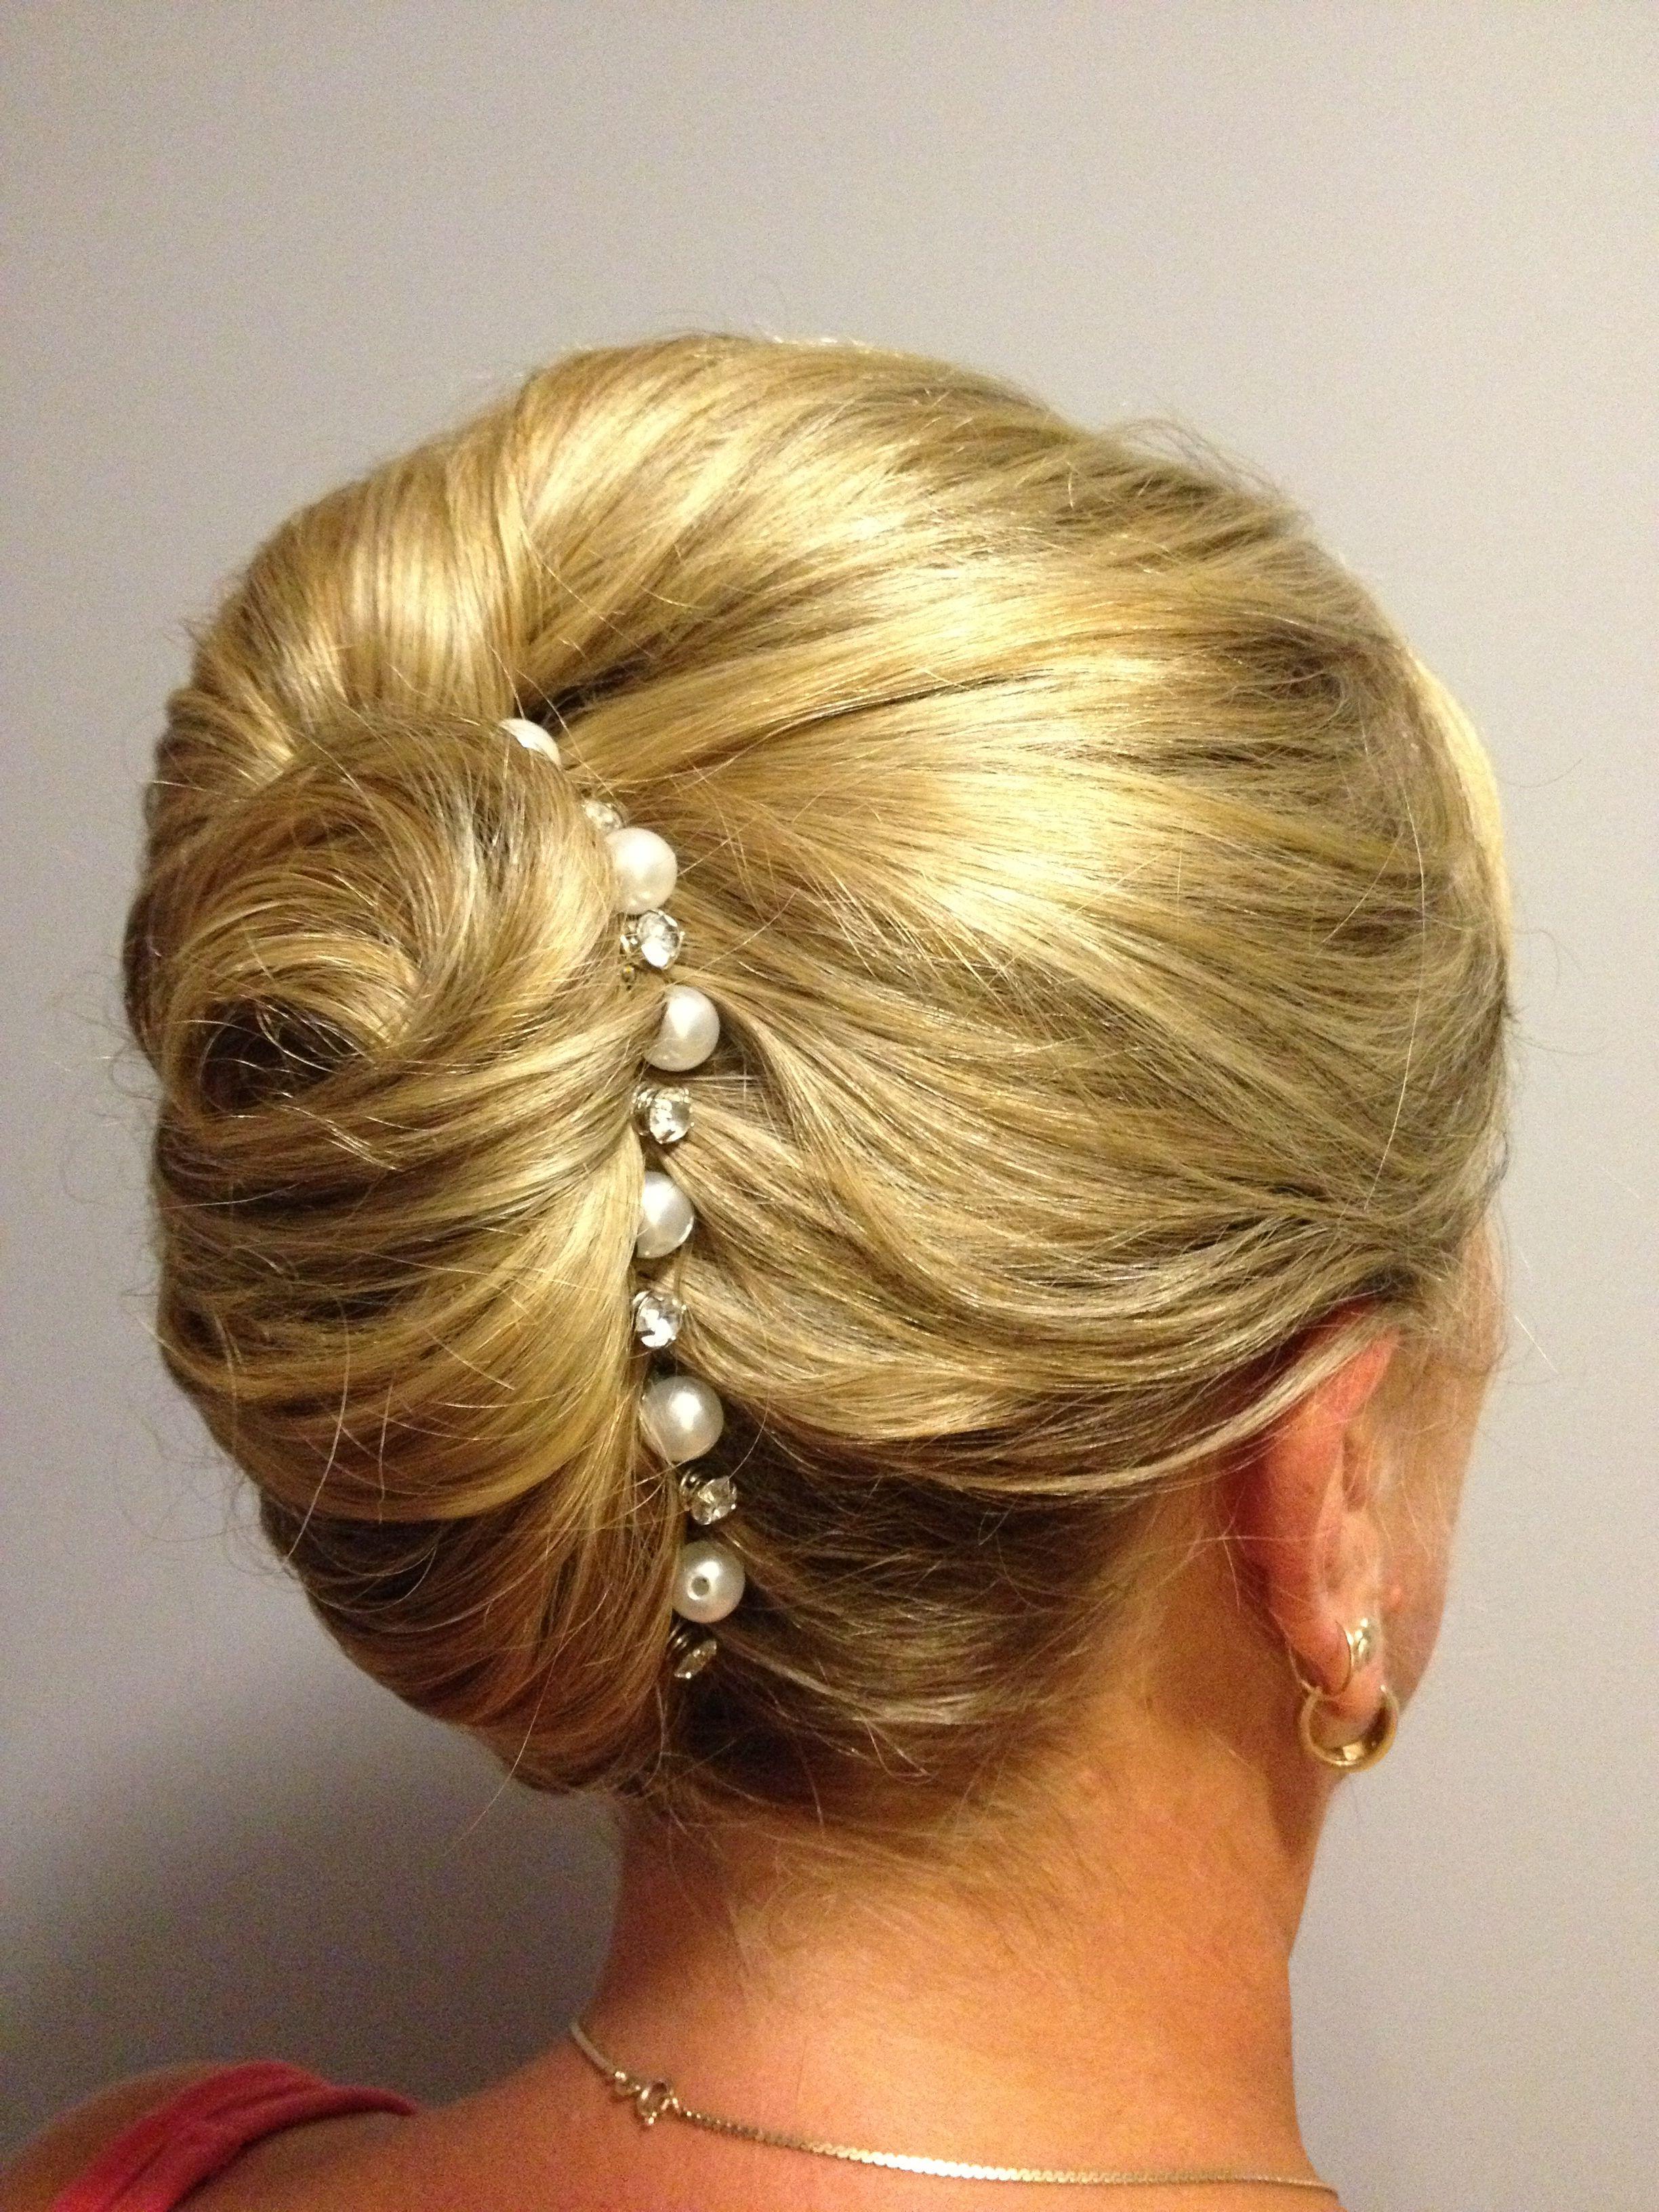 Hair done by ainsley orosz at david hillis salon hair